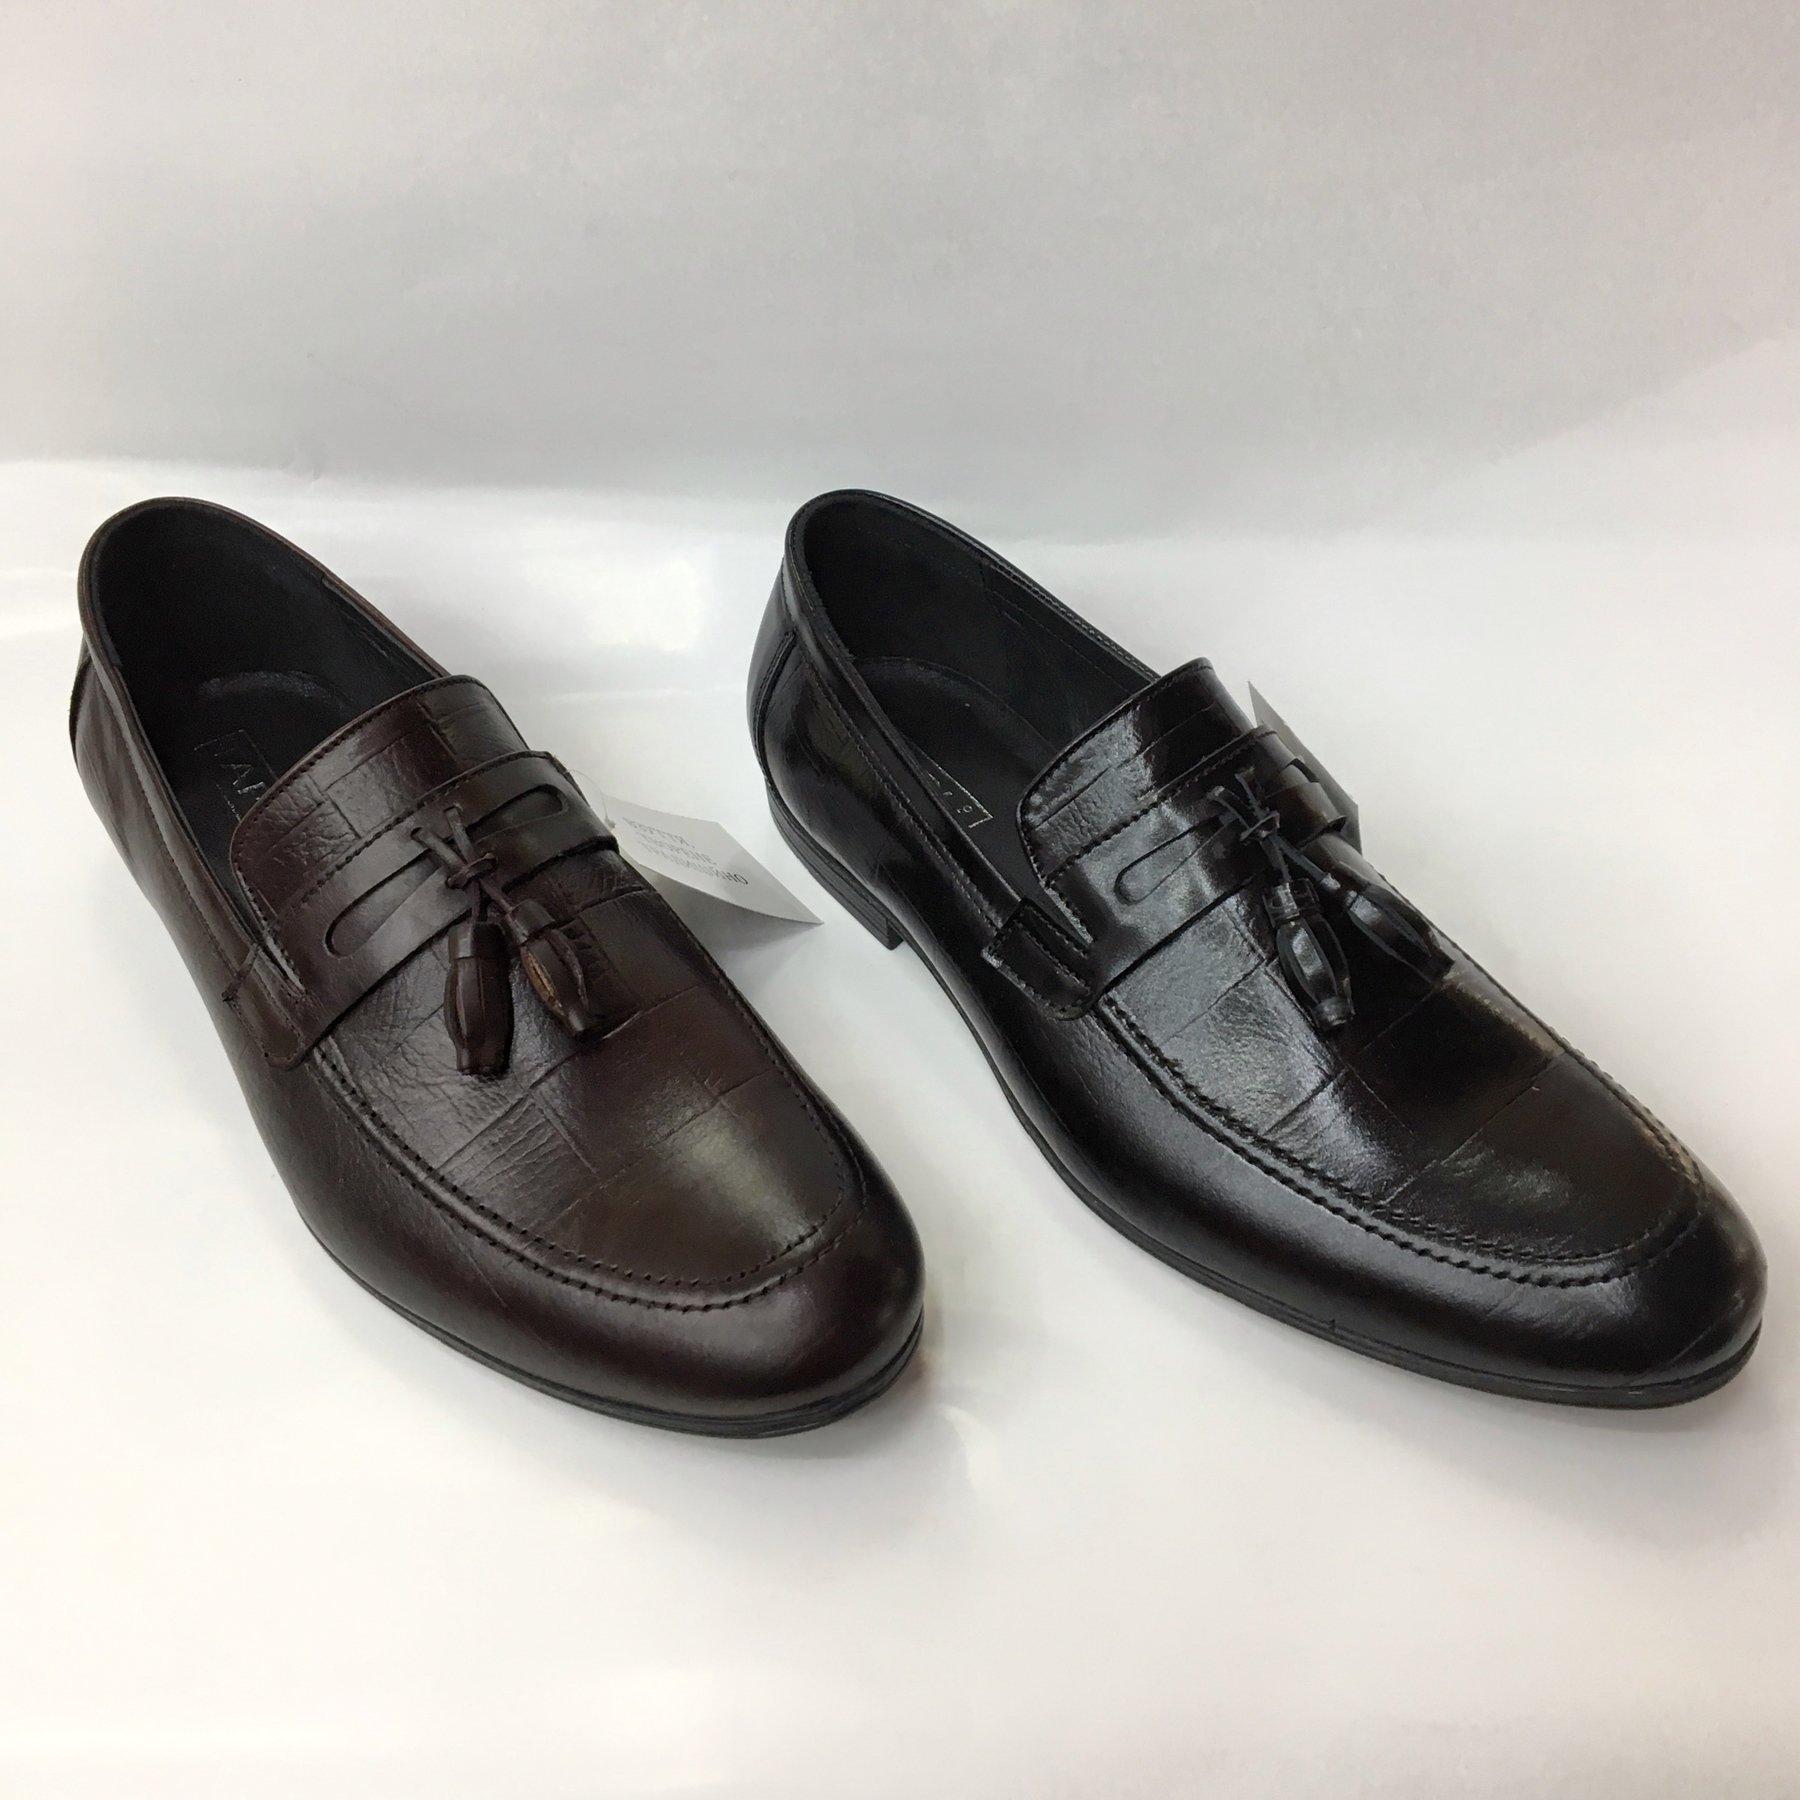 46a8b893e7e627 Магазини польського взуття «Гермес» на 032.ua